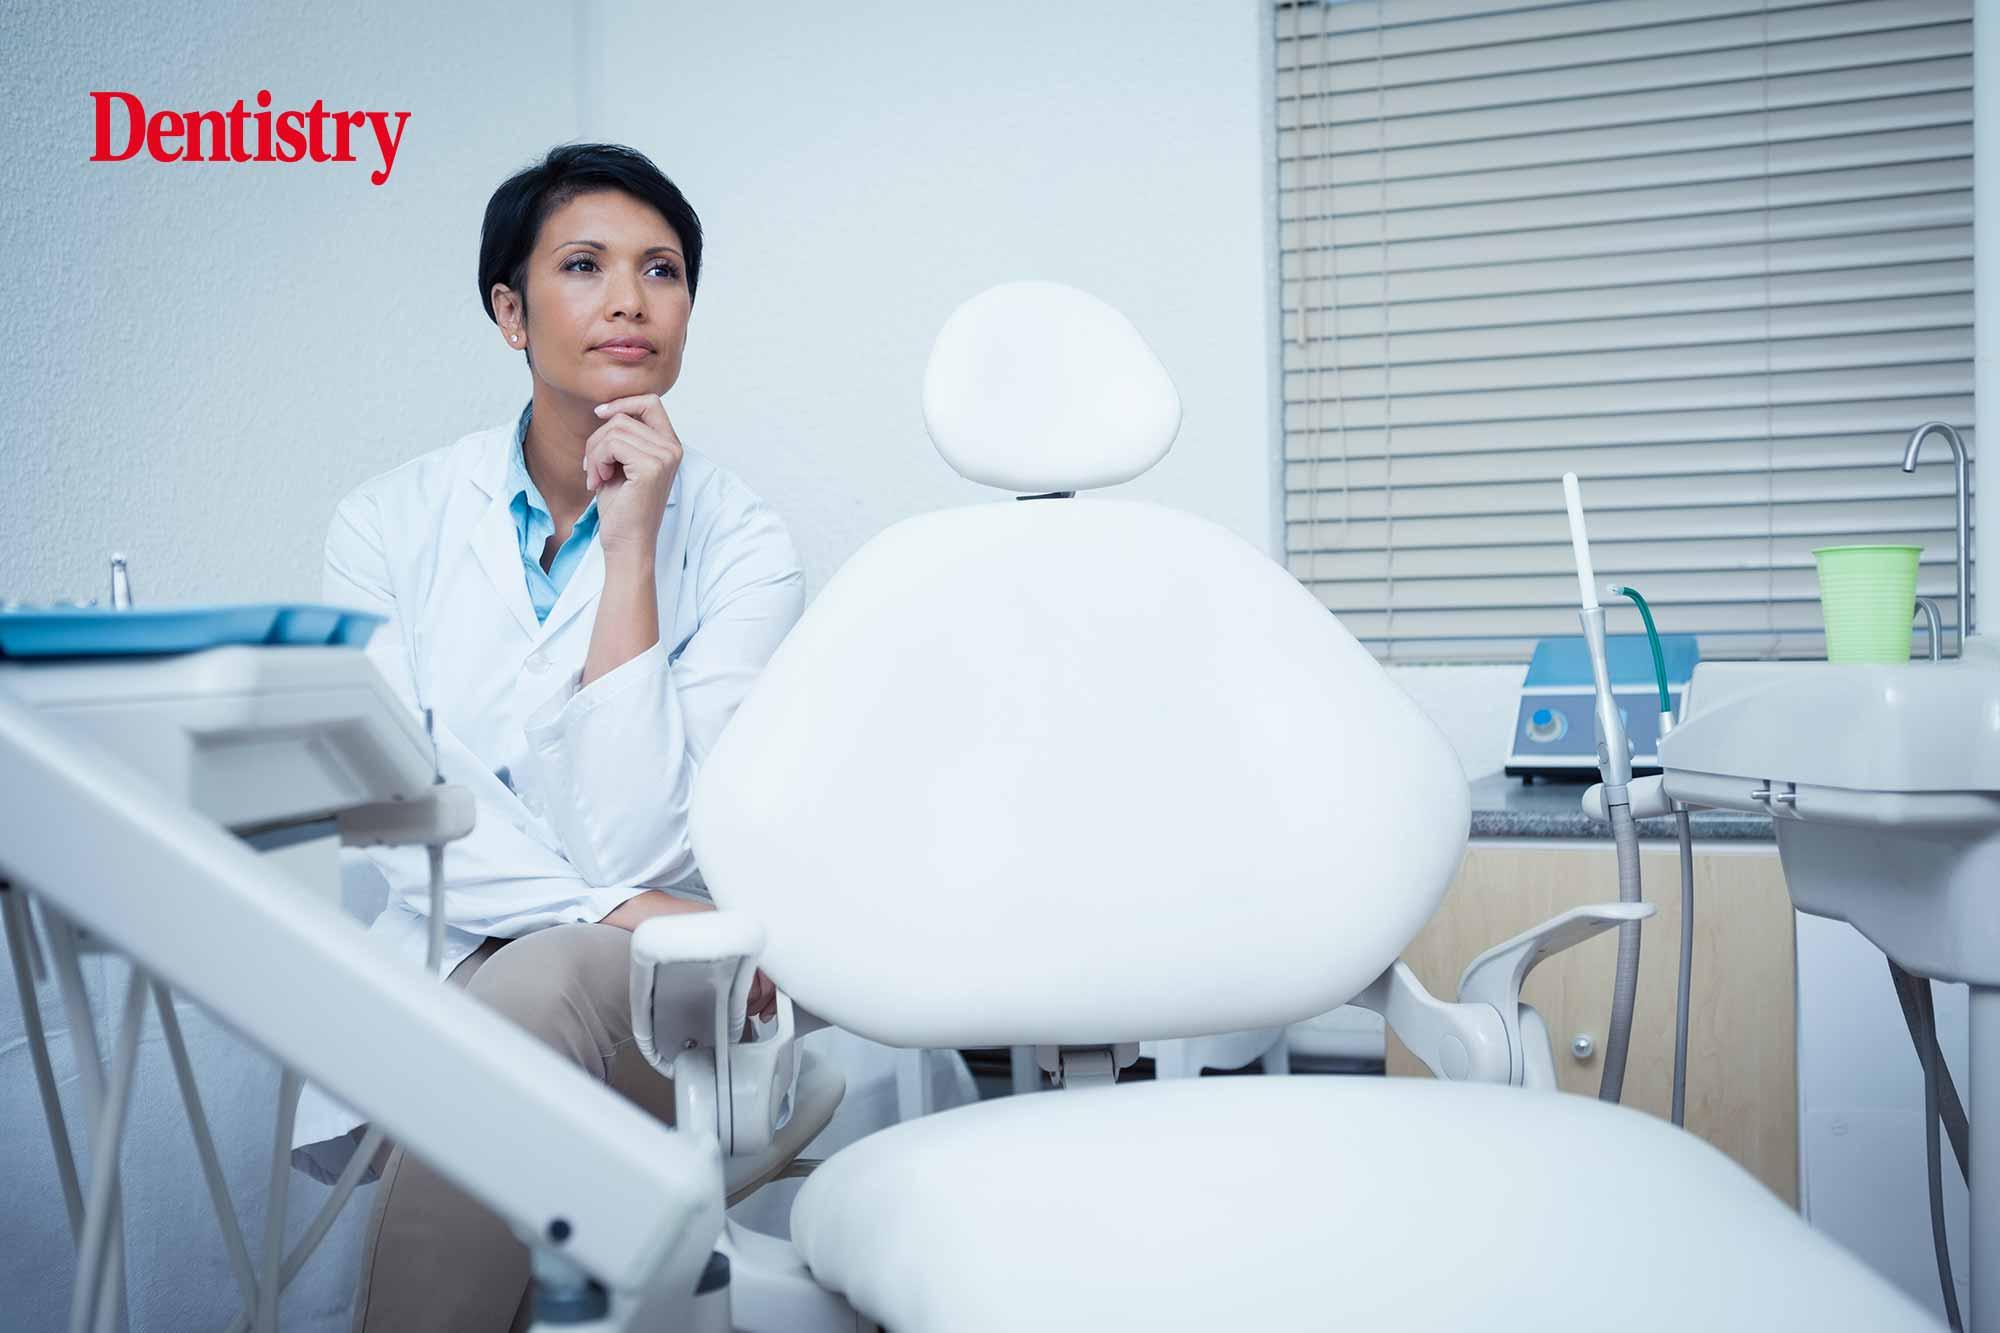 dentist considering pension options